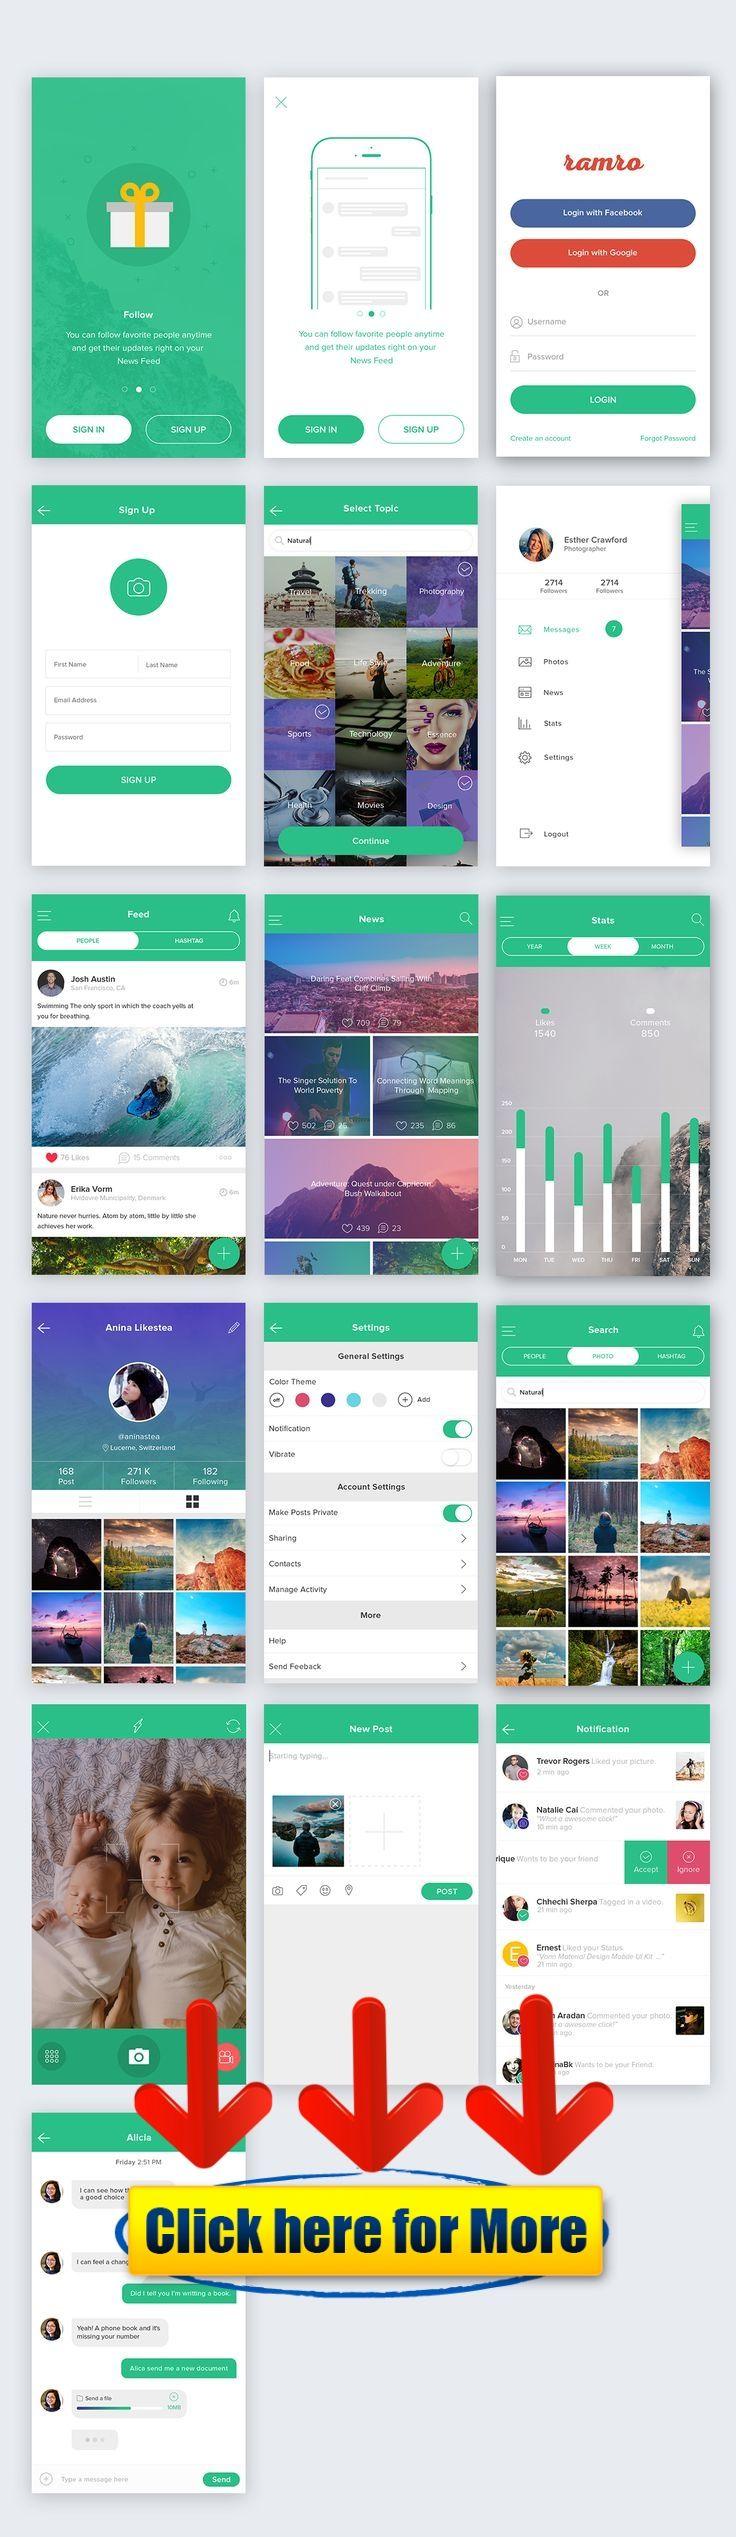 Ramro app template iOS #android #iphone #ios #app #free